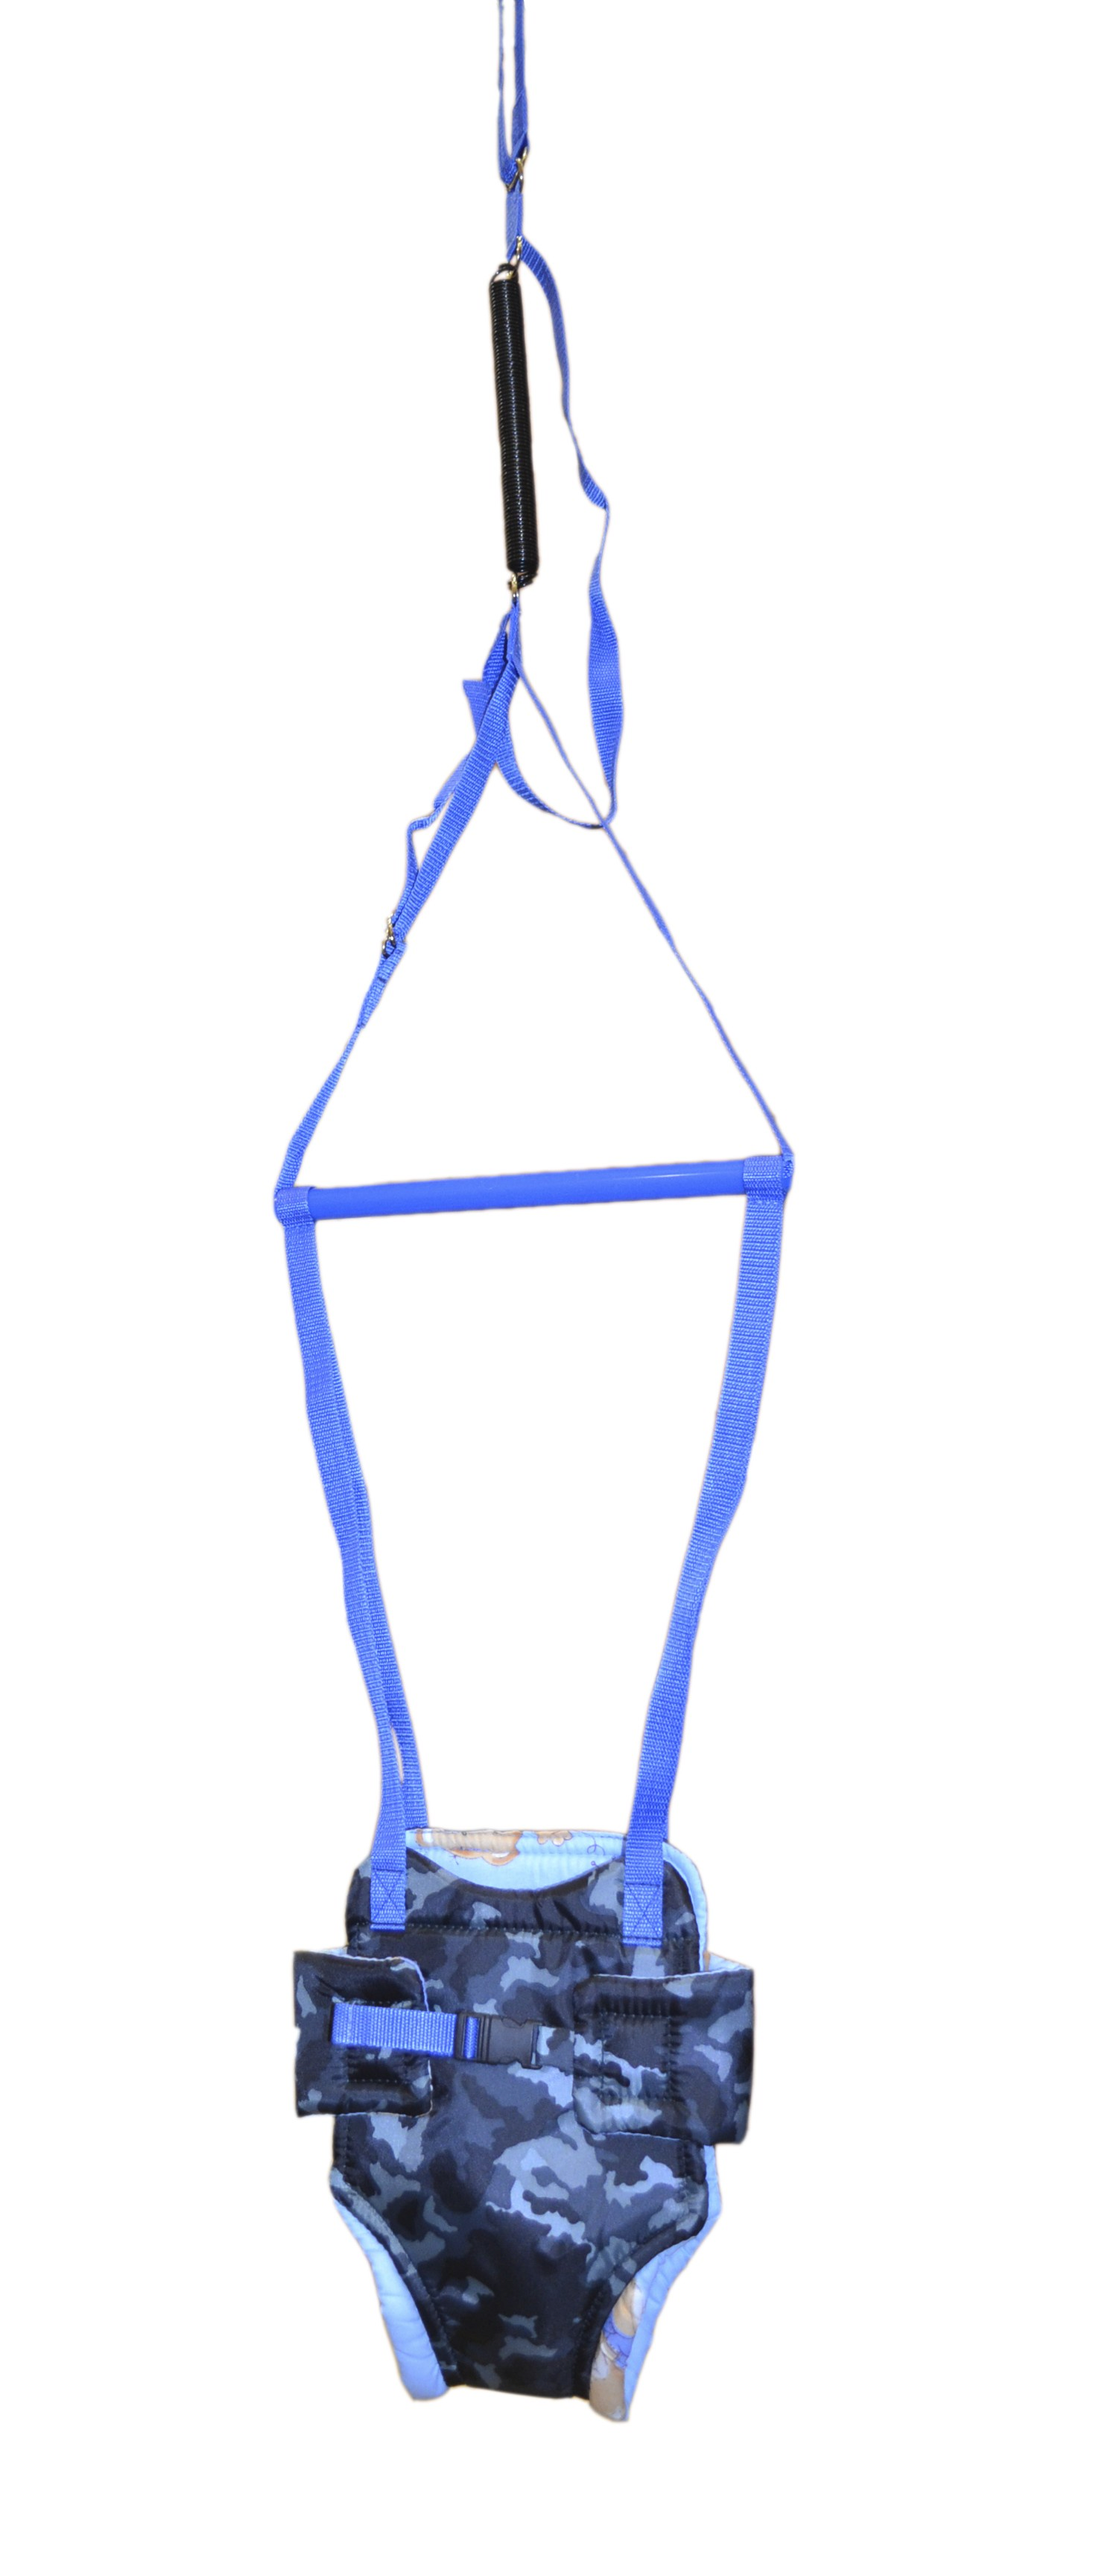 прыгунки Тренажер детский Мирти Прыгунки №2, 4610003450779, хаки, синий